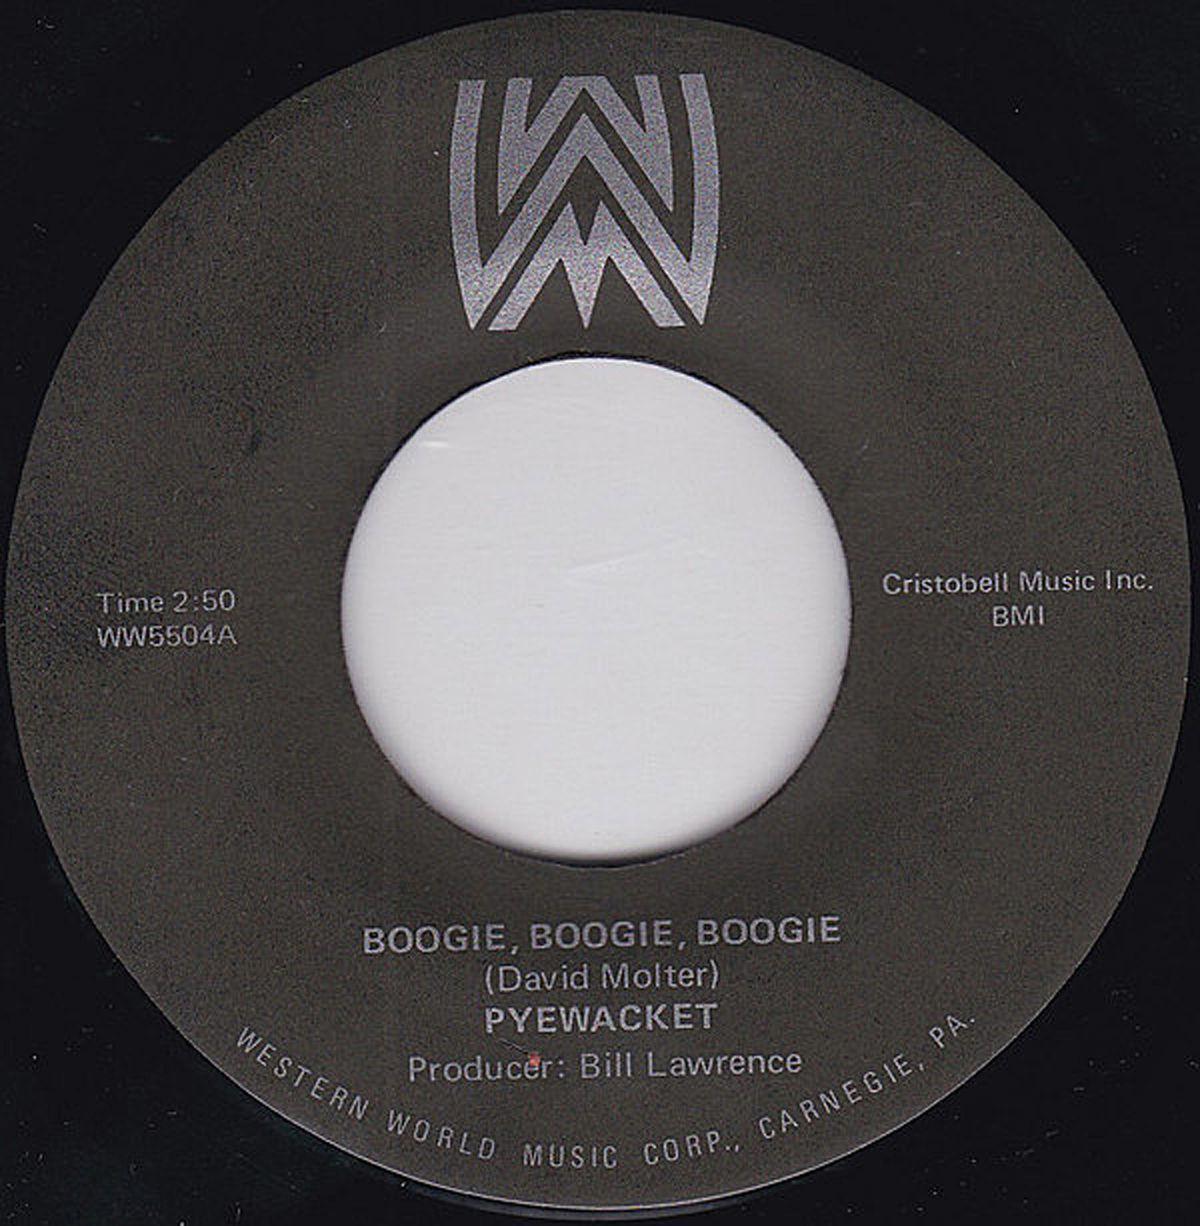 Boogie Boogie Boogie